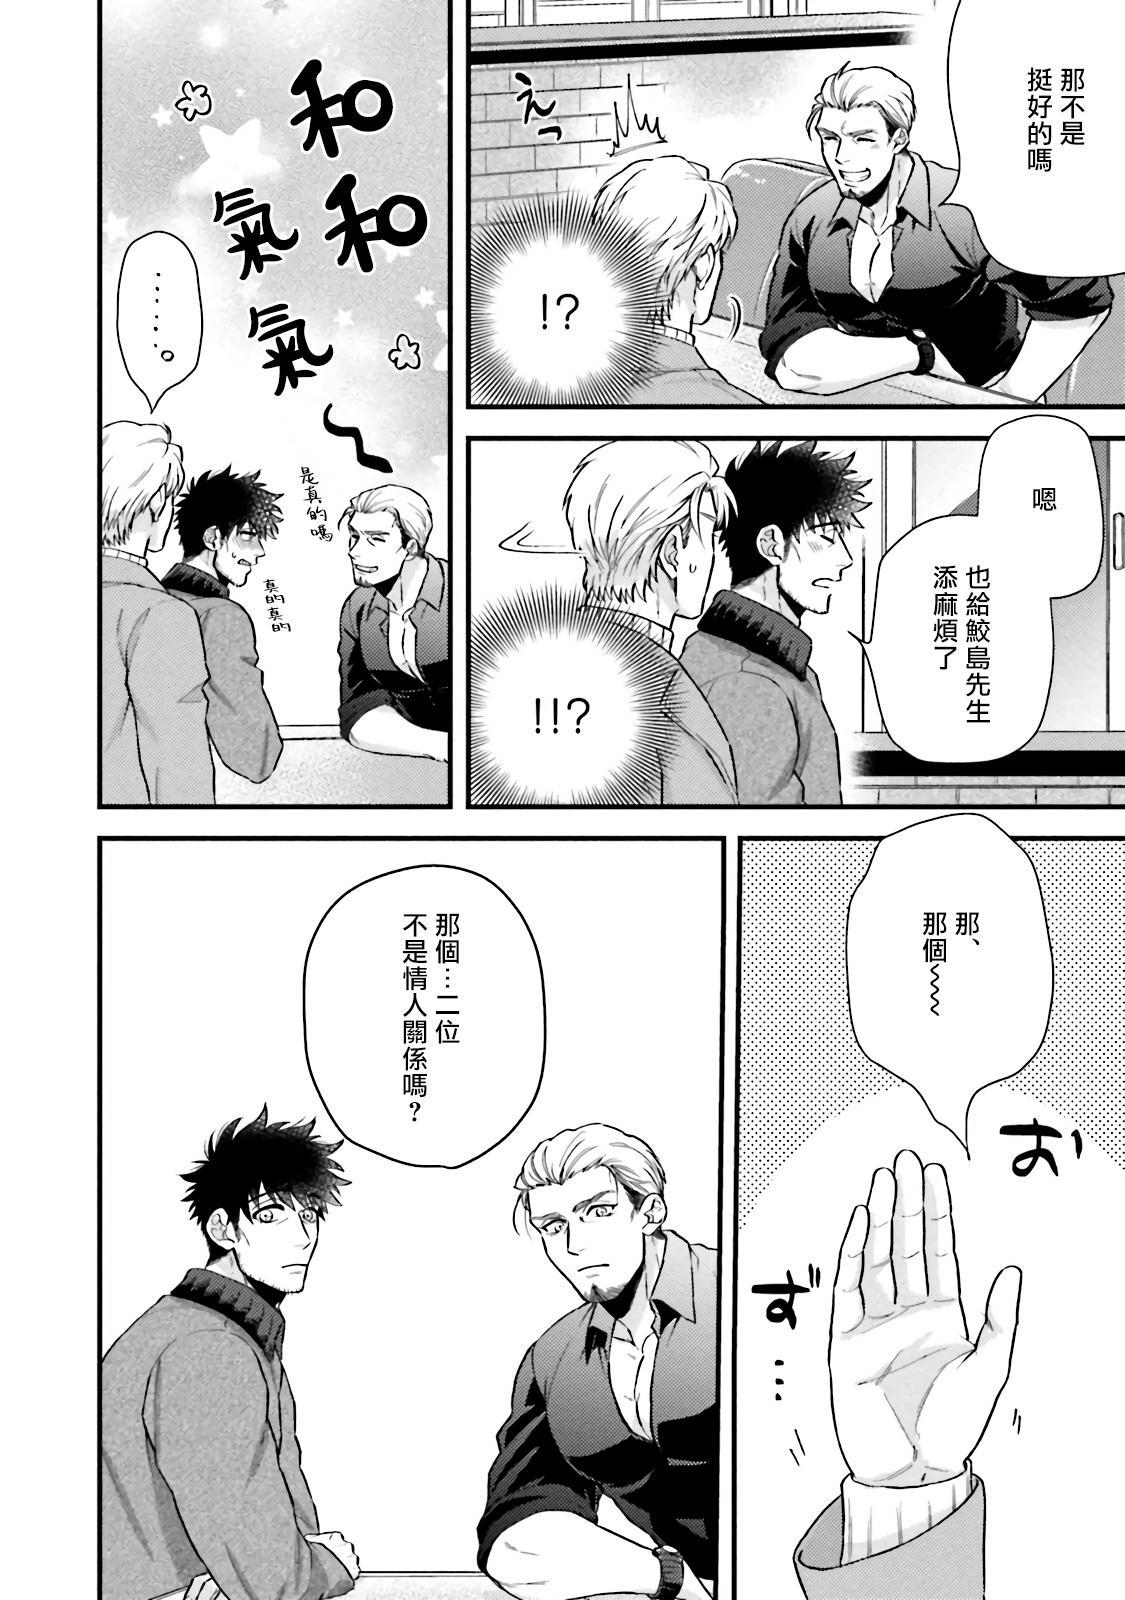 Kinou wa Otanoshimi Deshita ne | 昨天过得很愉快吧 Ch. 1-4+特典 172